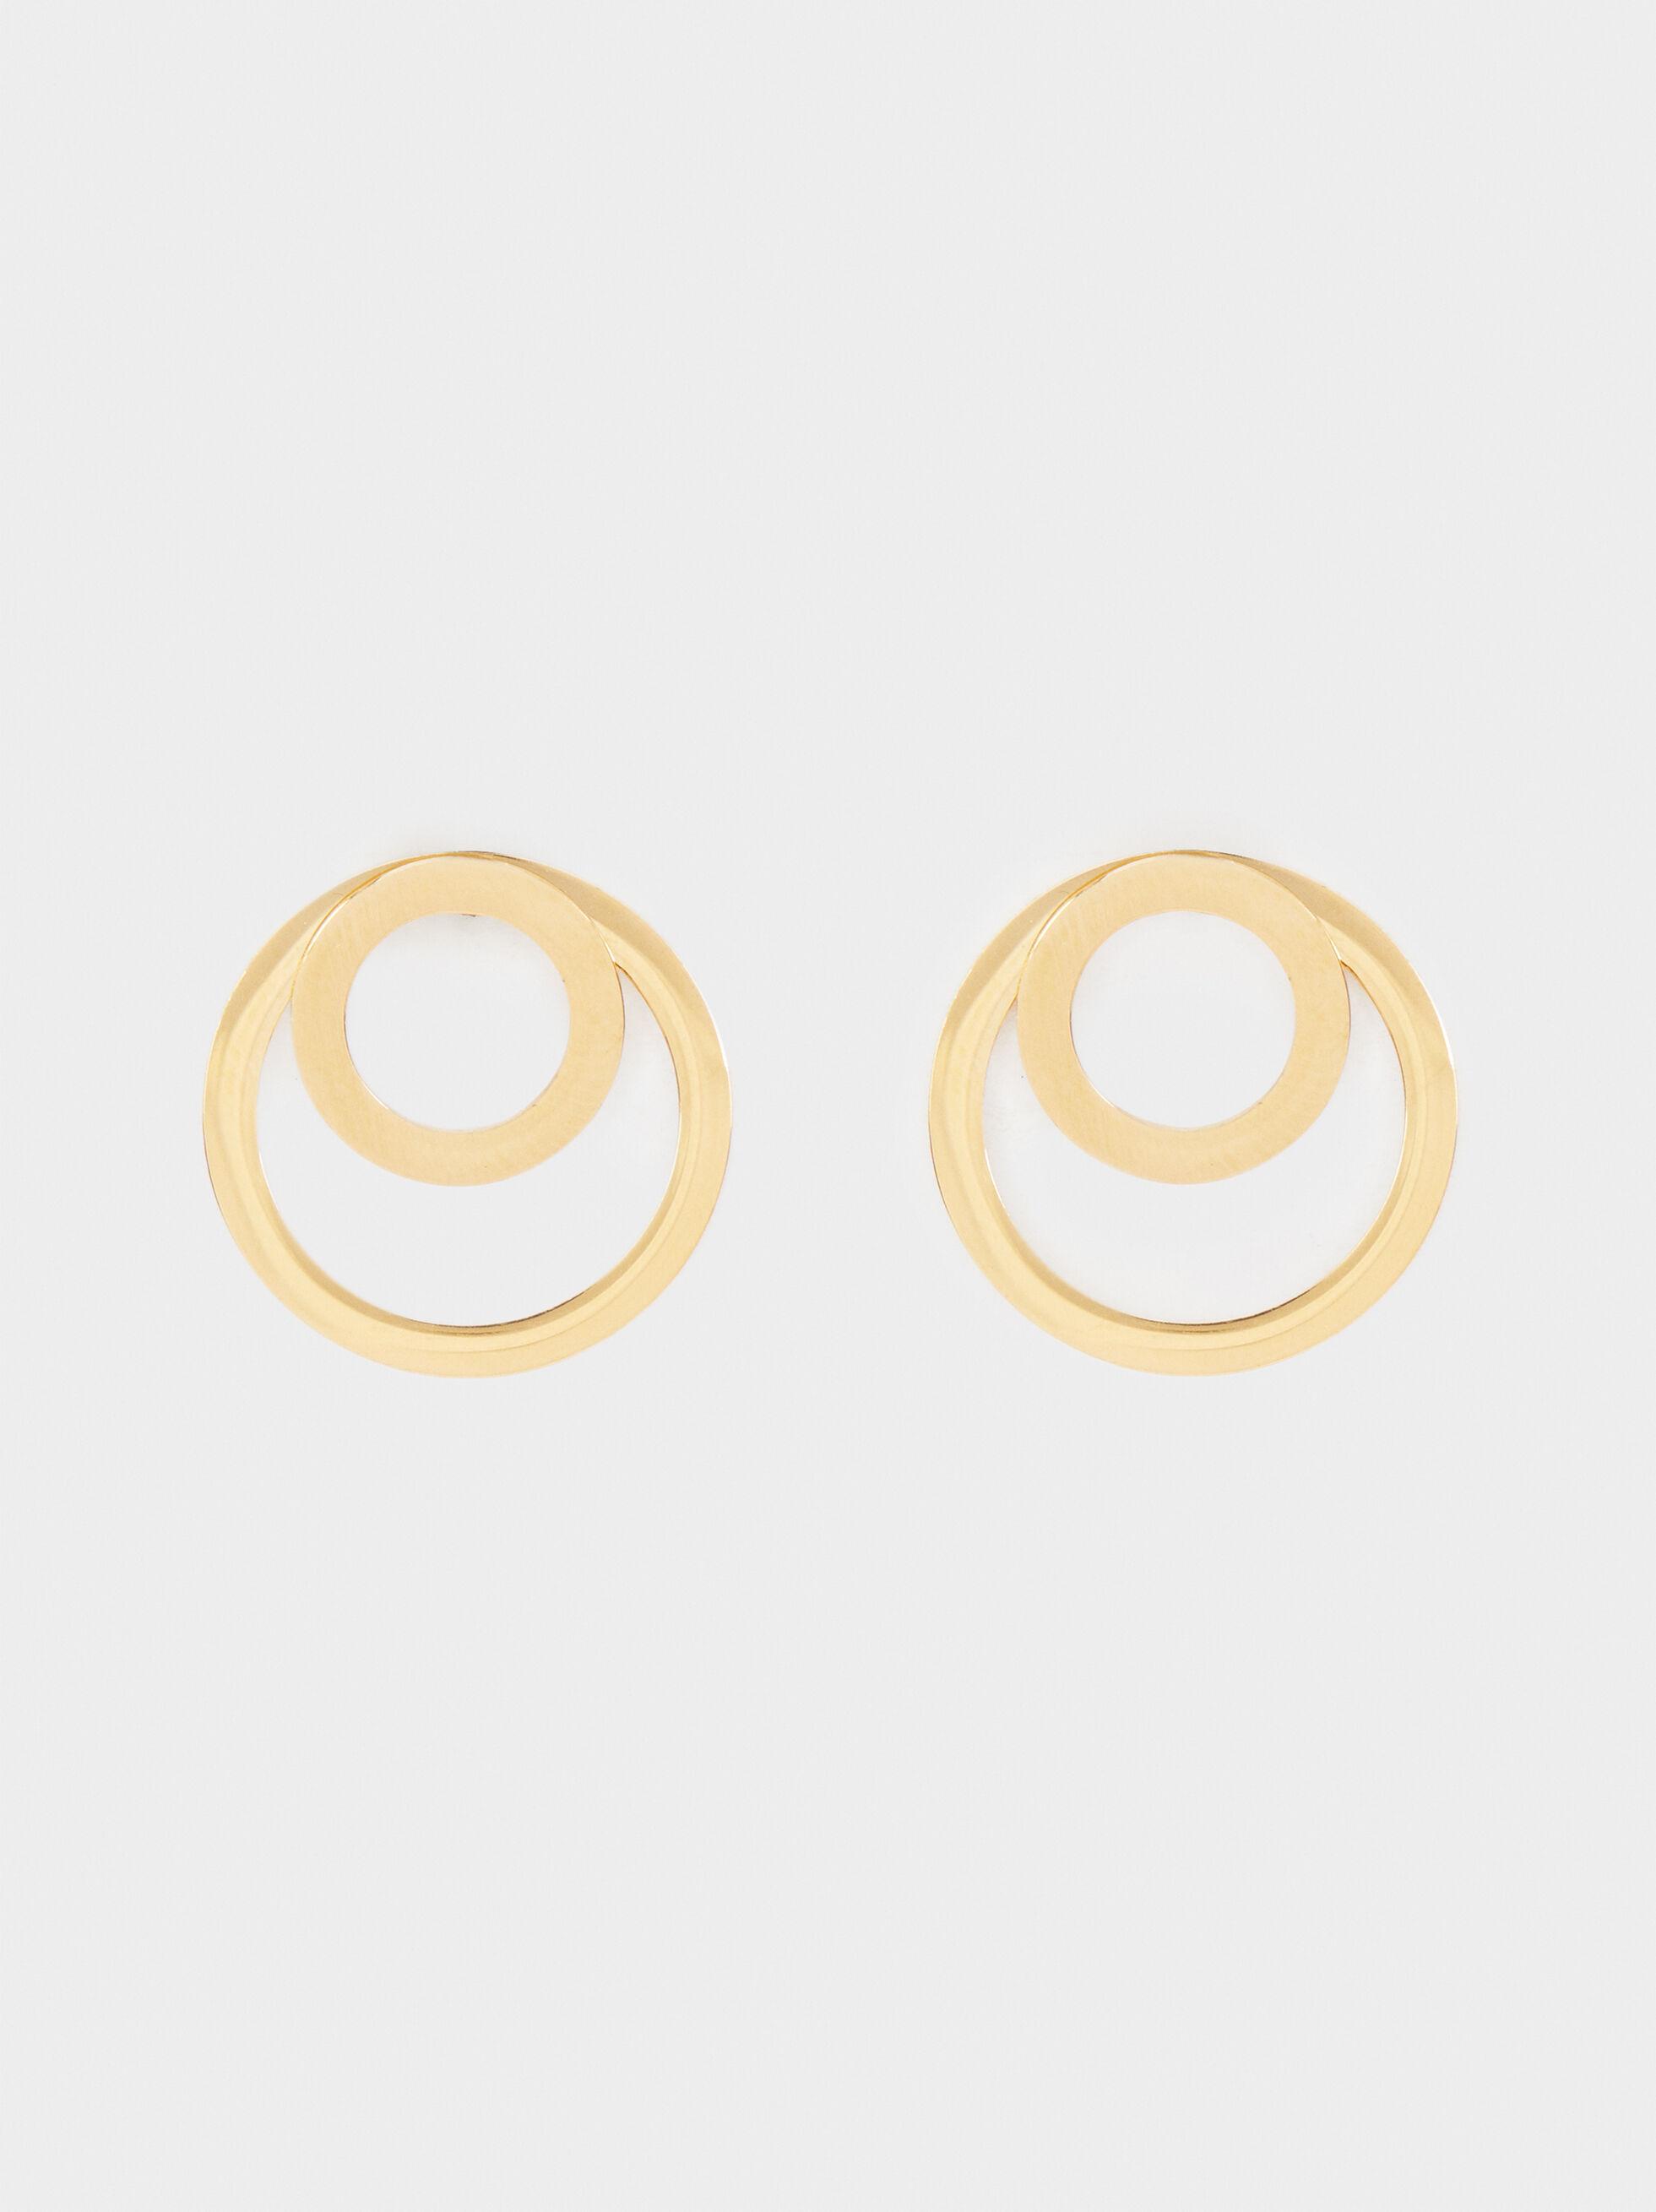 Short Gold Stainless Steel Earrings, , hi-res